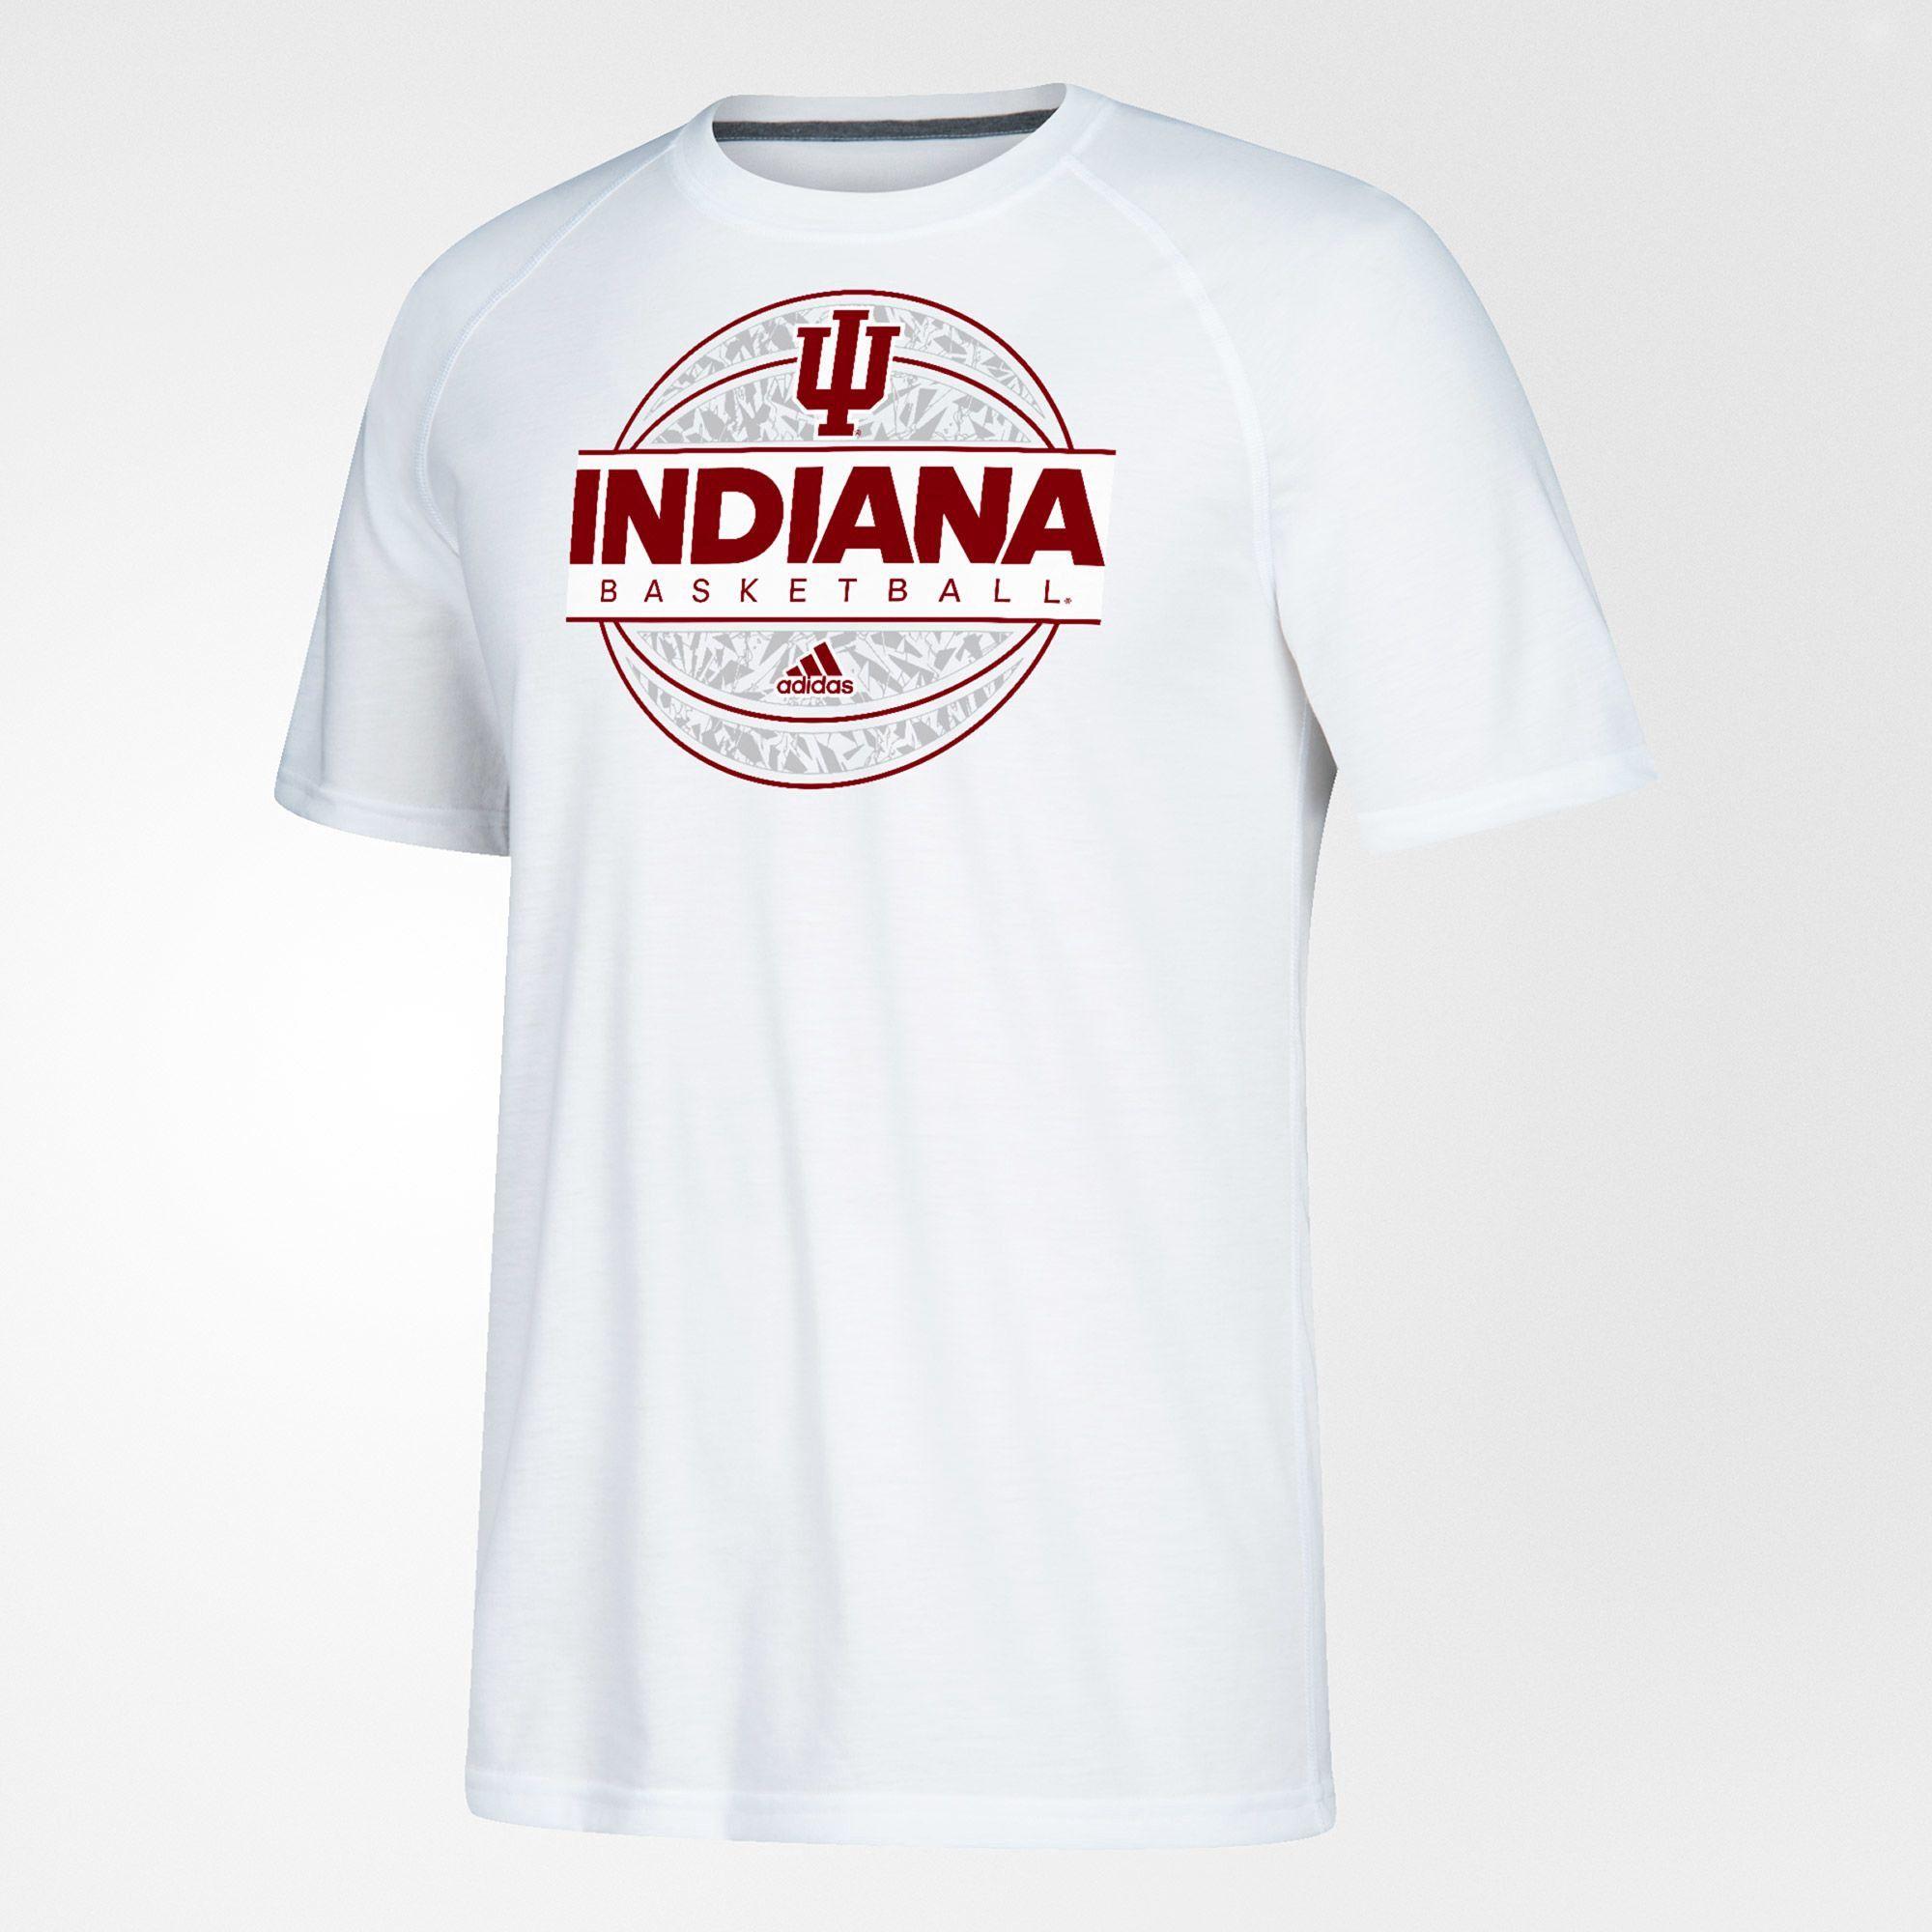 ADIDAS ORIGINALS Indiana Adidas adidasoriginals cloth Adidas Indiana 141826